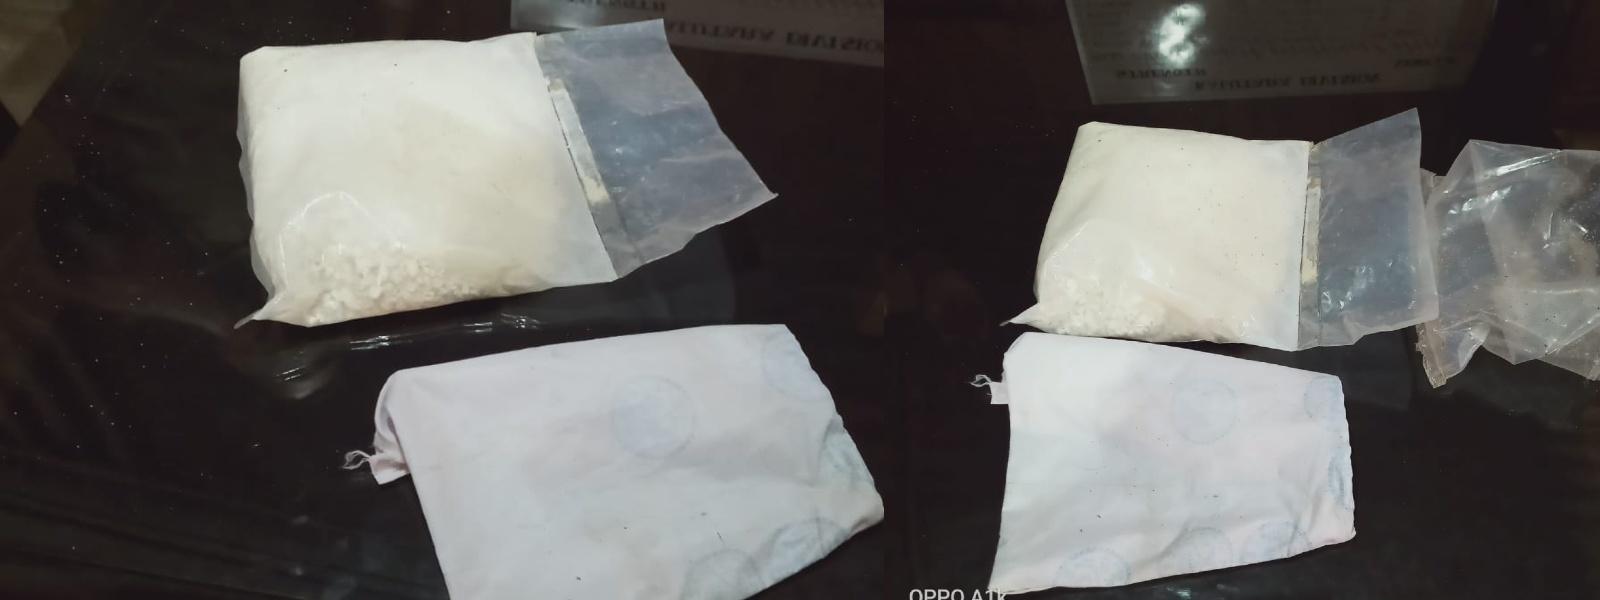 01kg of Cocaine discovered on Payagala beach